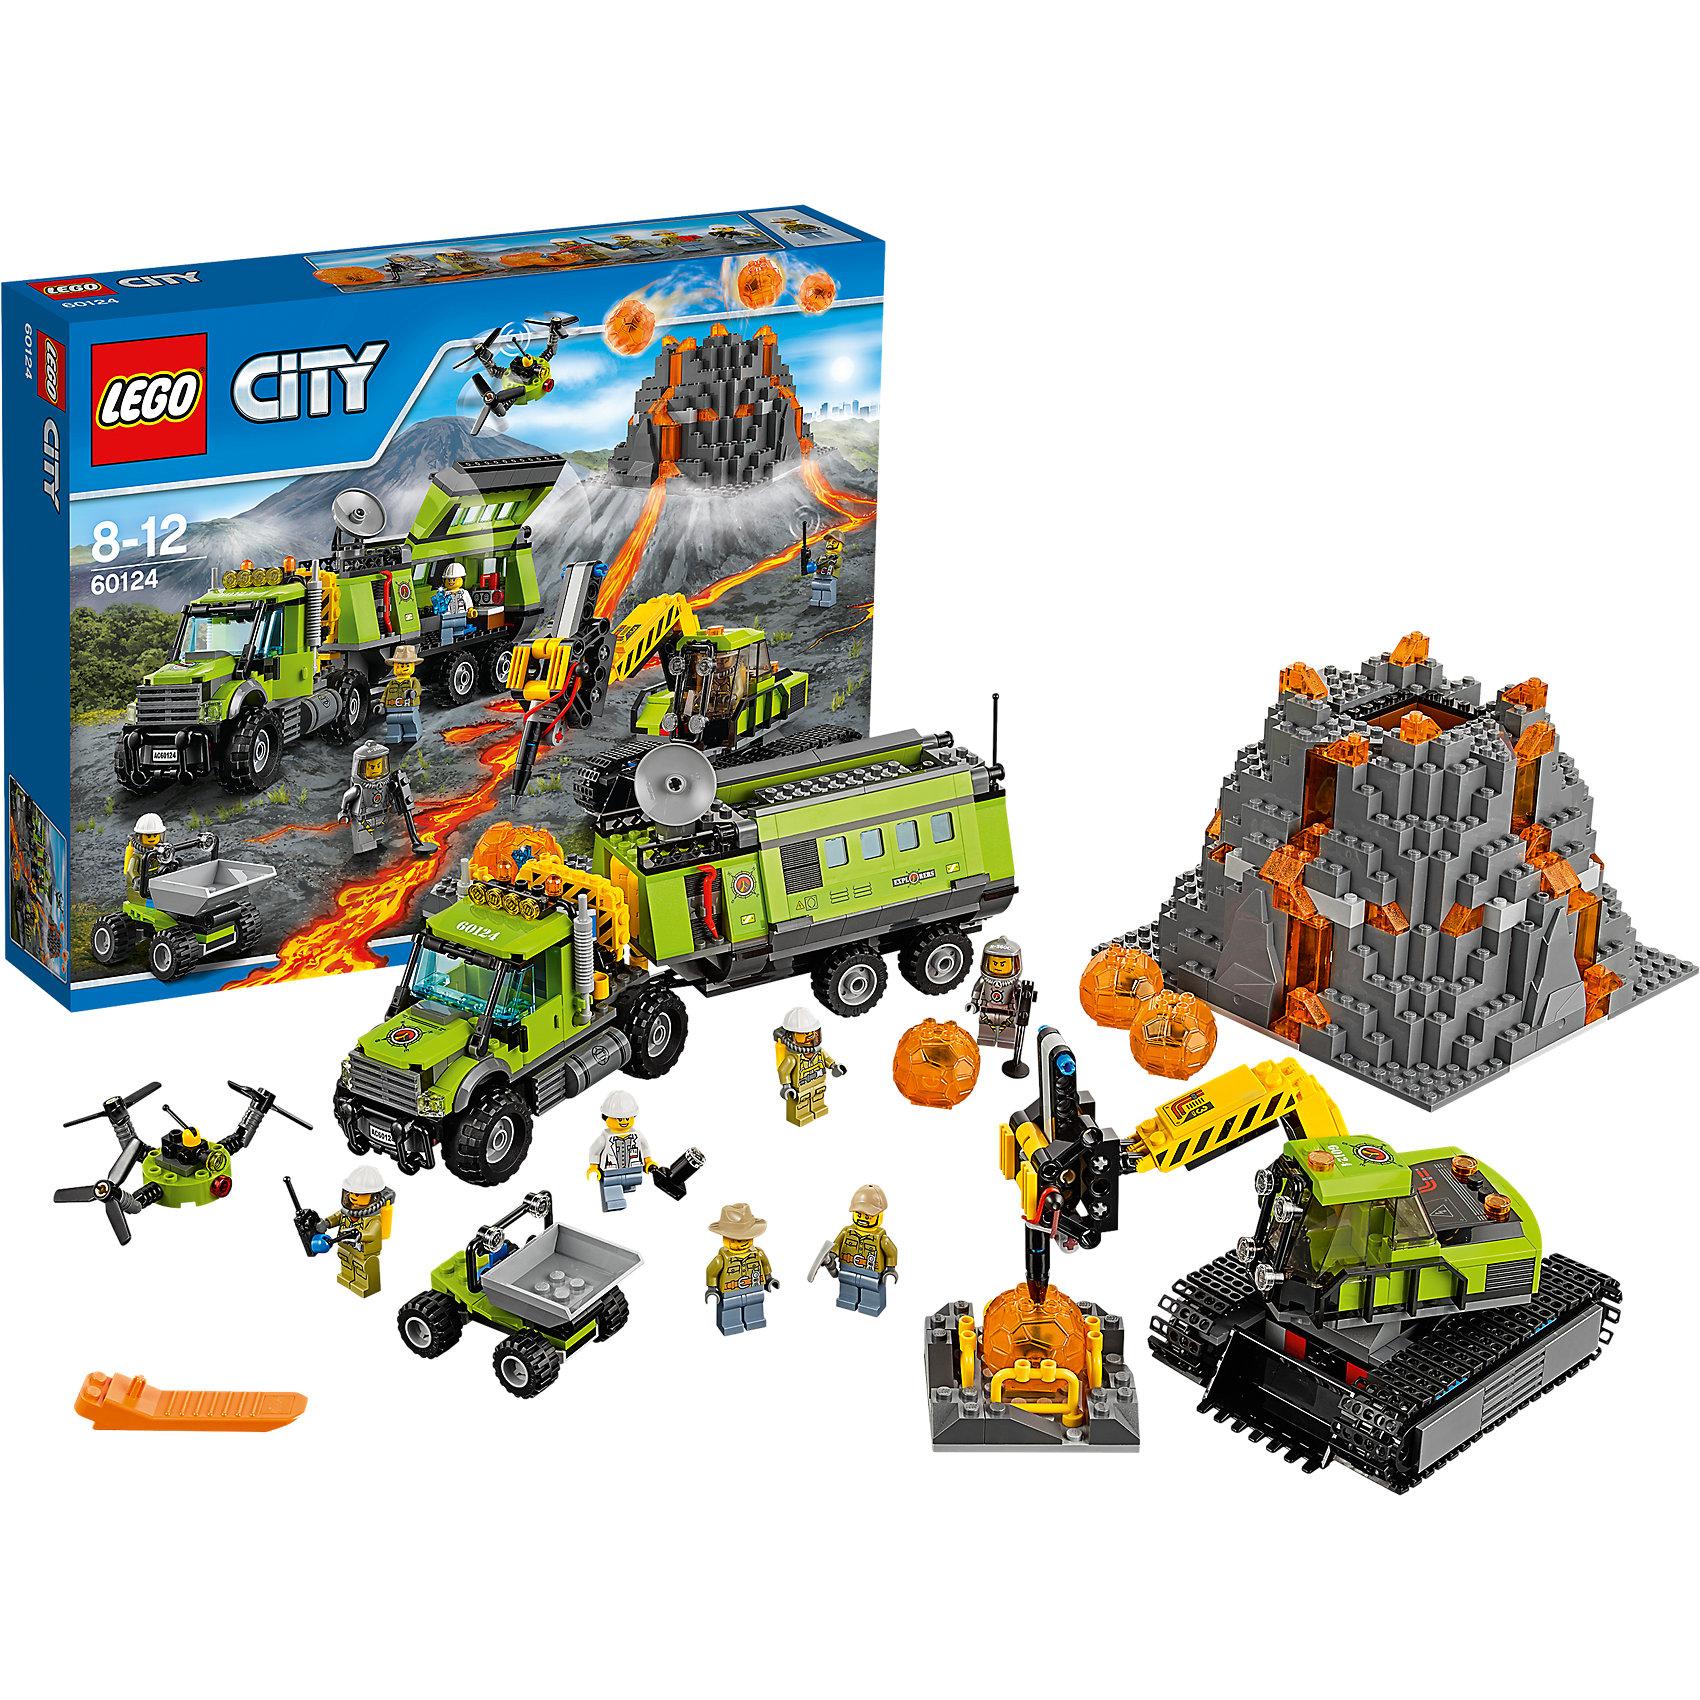 LEGO LEGO City 60124: База исследователей вулканов lego lego city 60124 база исследователей вулканов